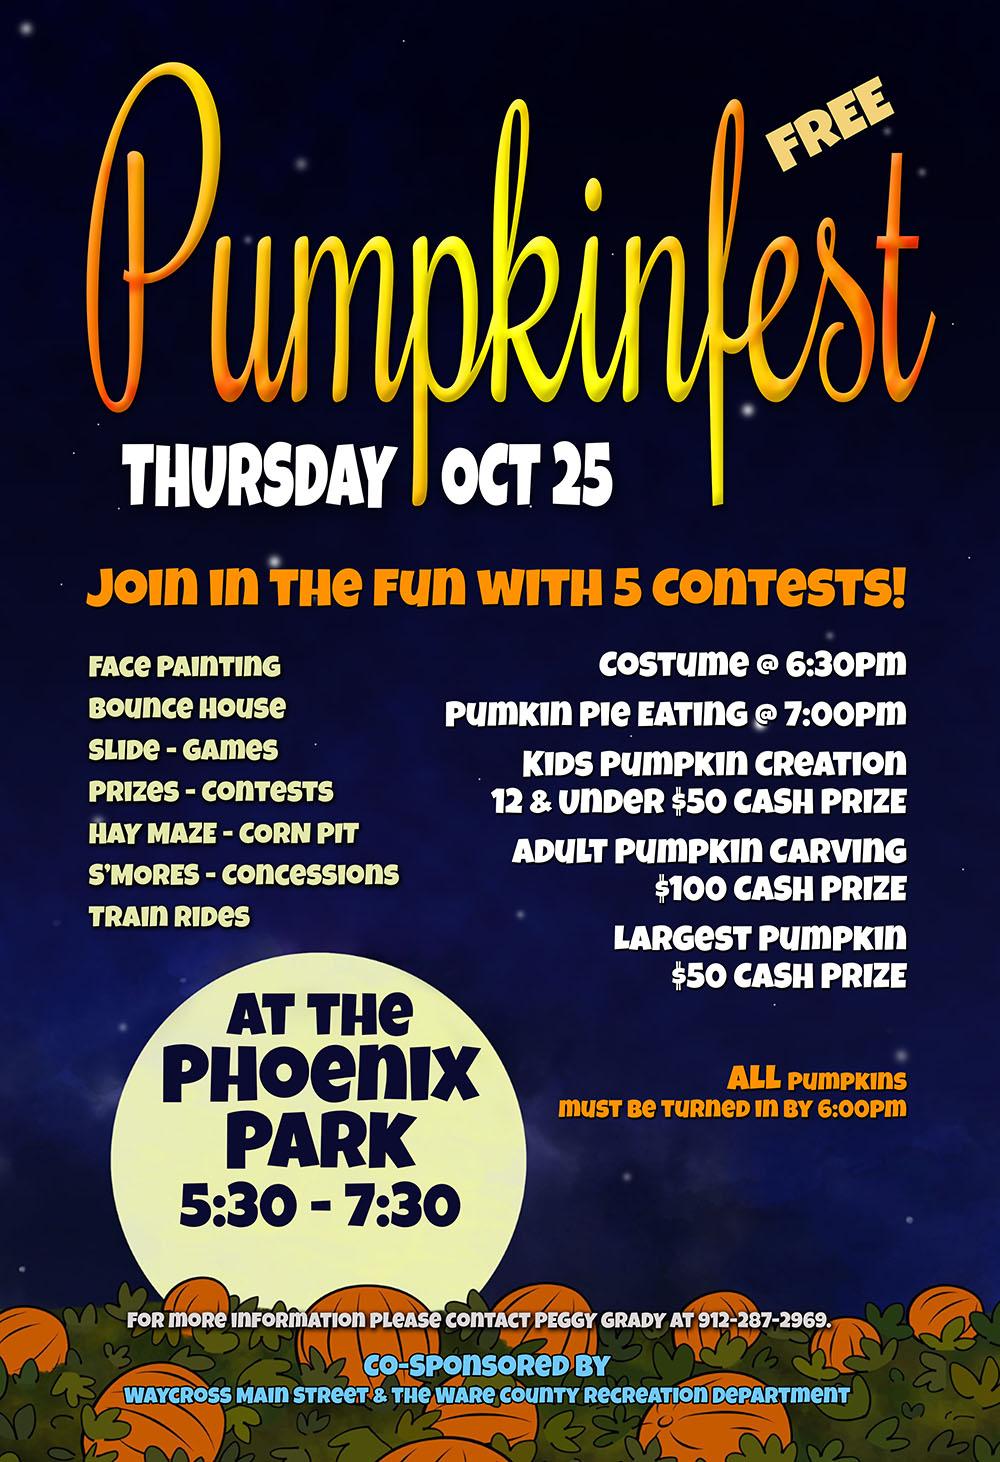 Pumpkinfest @ Phoenix Park | Waycross | Georgia | United States